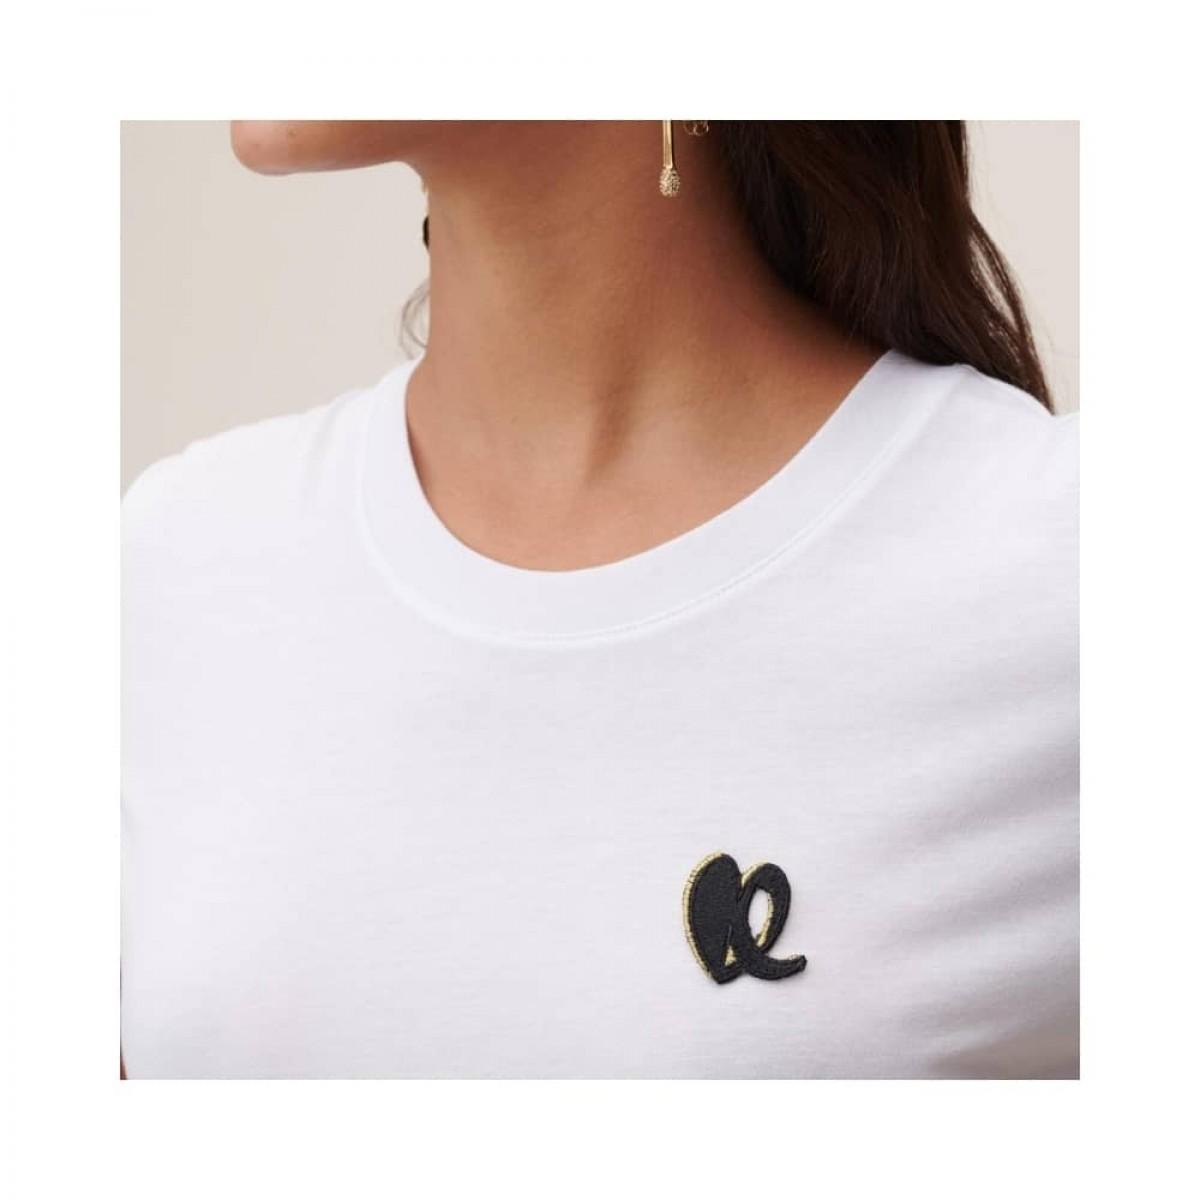 cara heart t-shirt - white - model logo